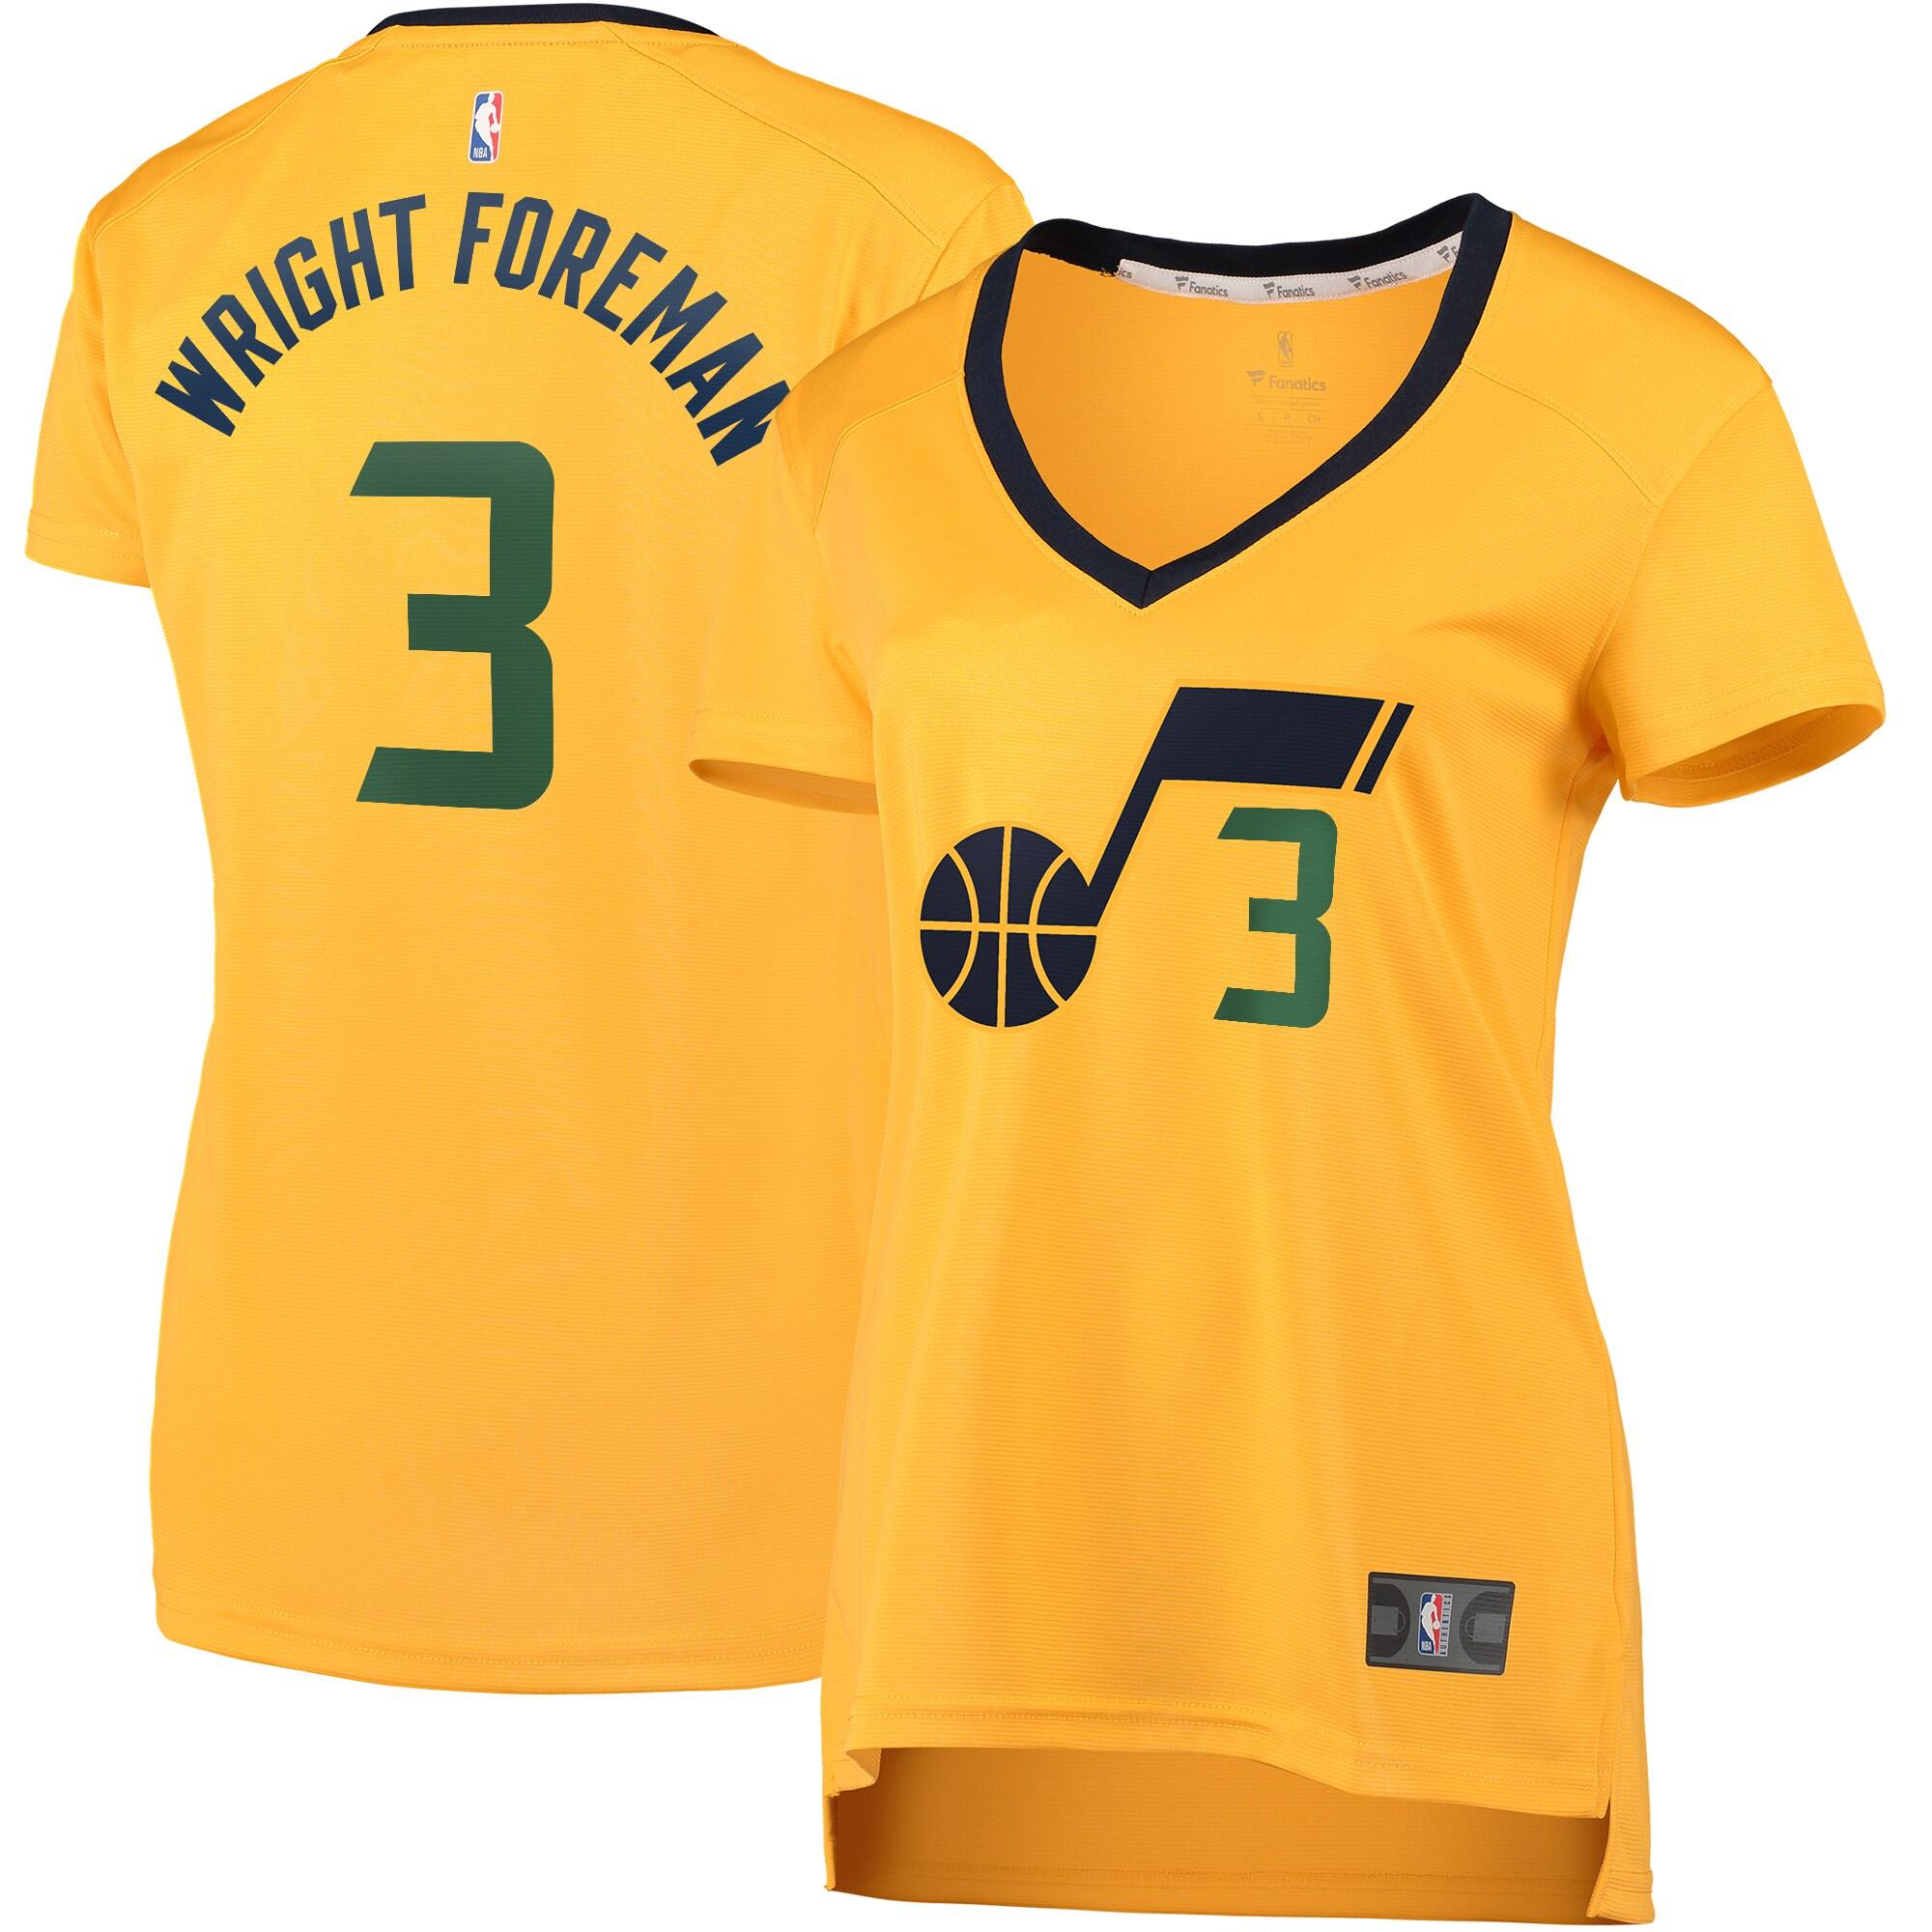 Justin Wright-Foreman Utah Jazz Fanatics Branded Women's Fast Break Replica Jersey Gold - Statement Edition